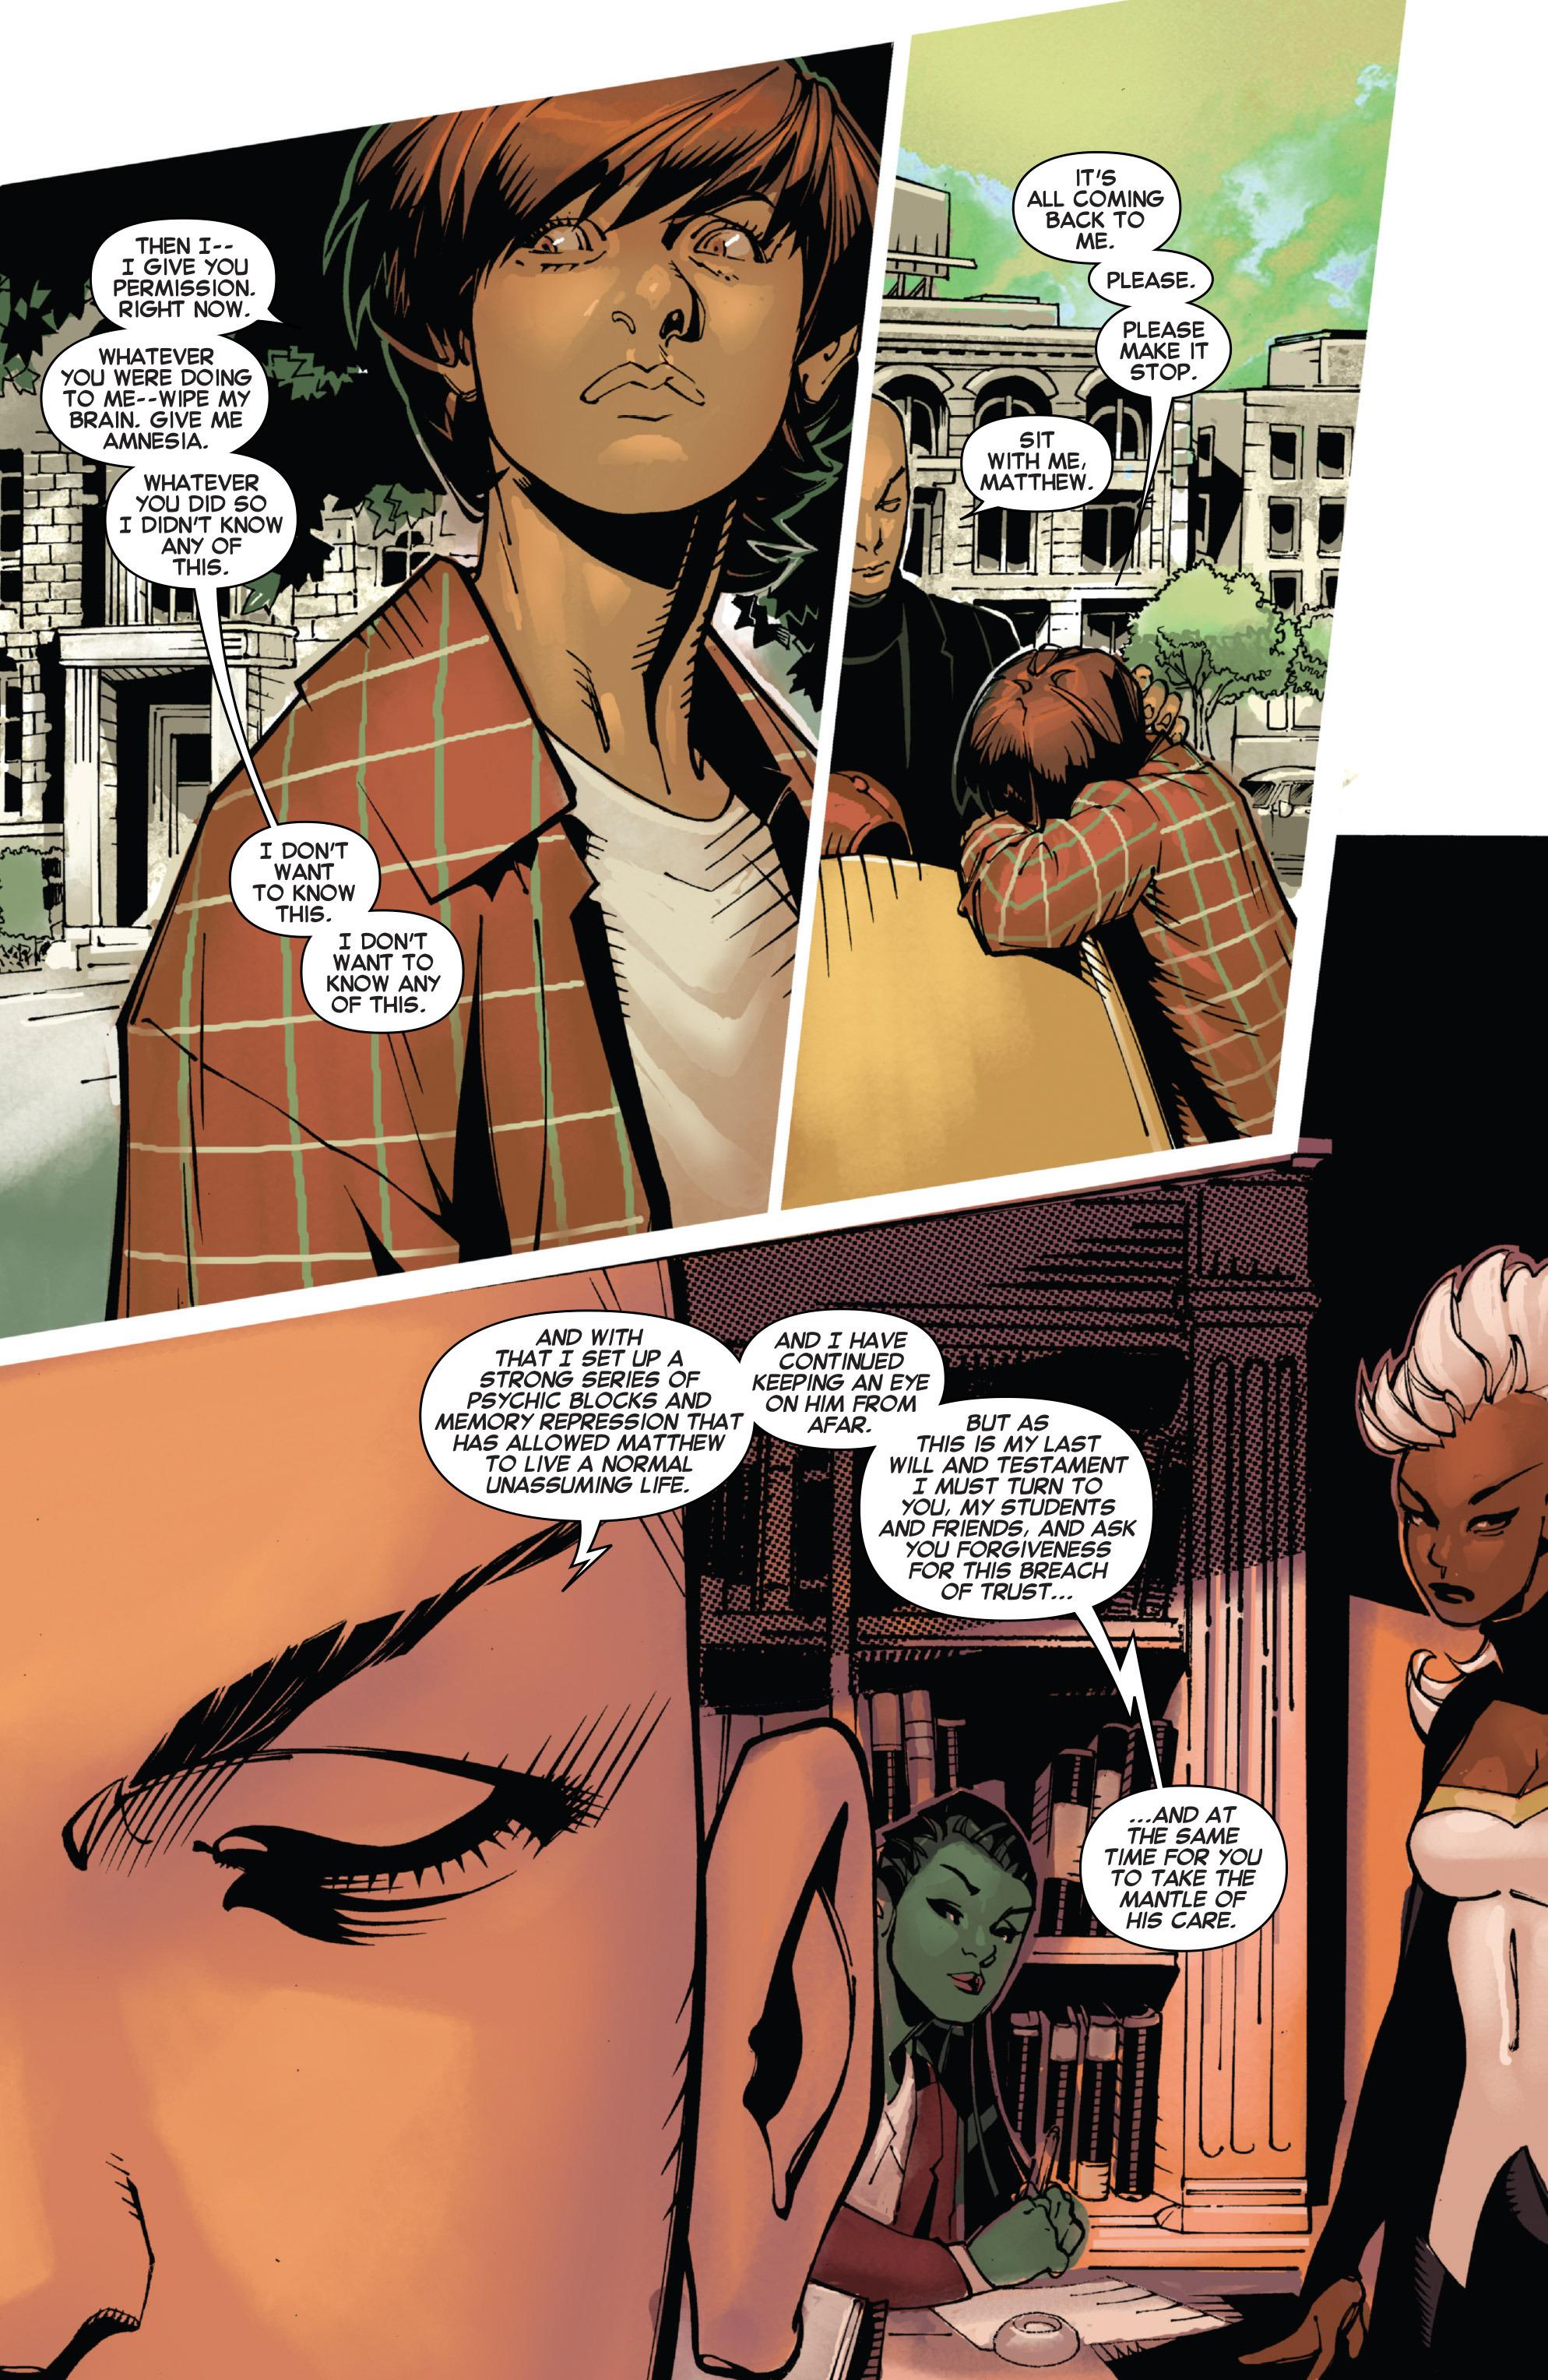 Read online Uncanny X-Men (2013) comic -  Issue # _TPB 4 - vs. S.H.I.E.L.D - 141